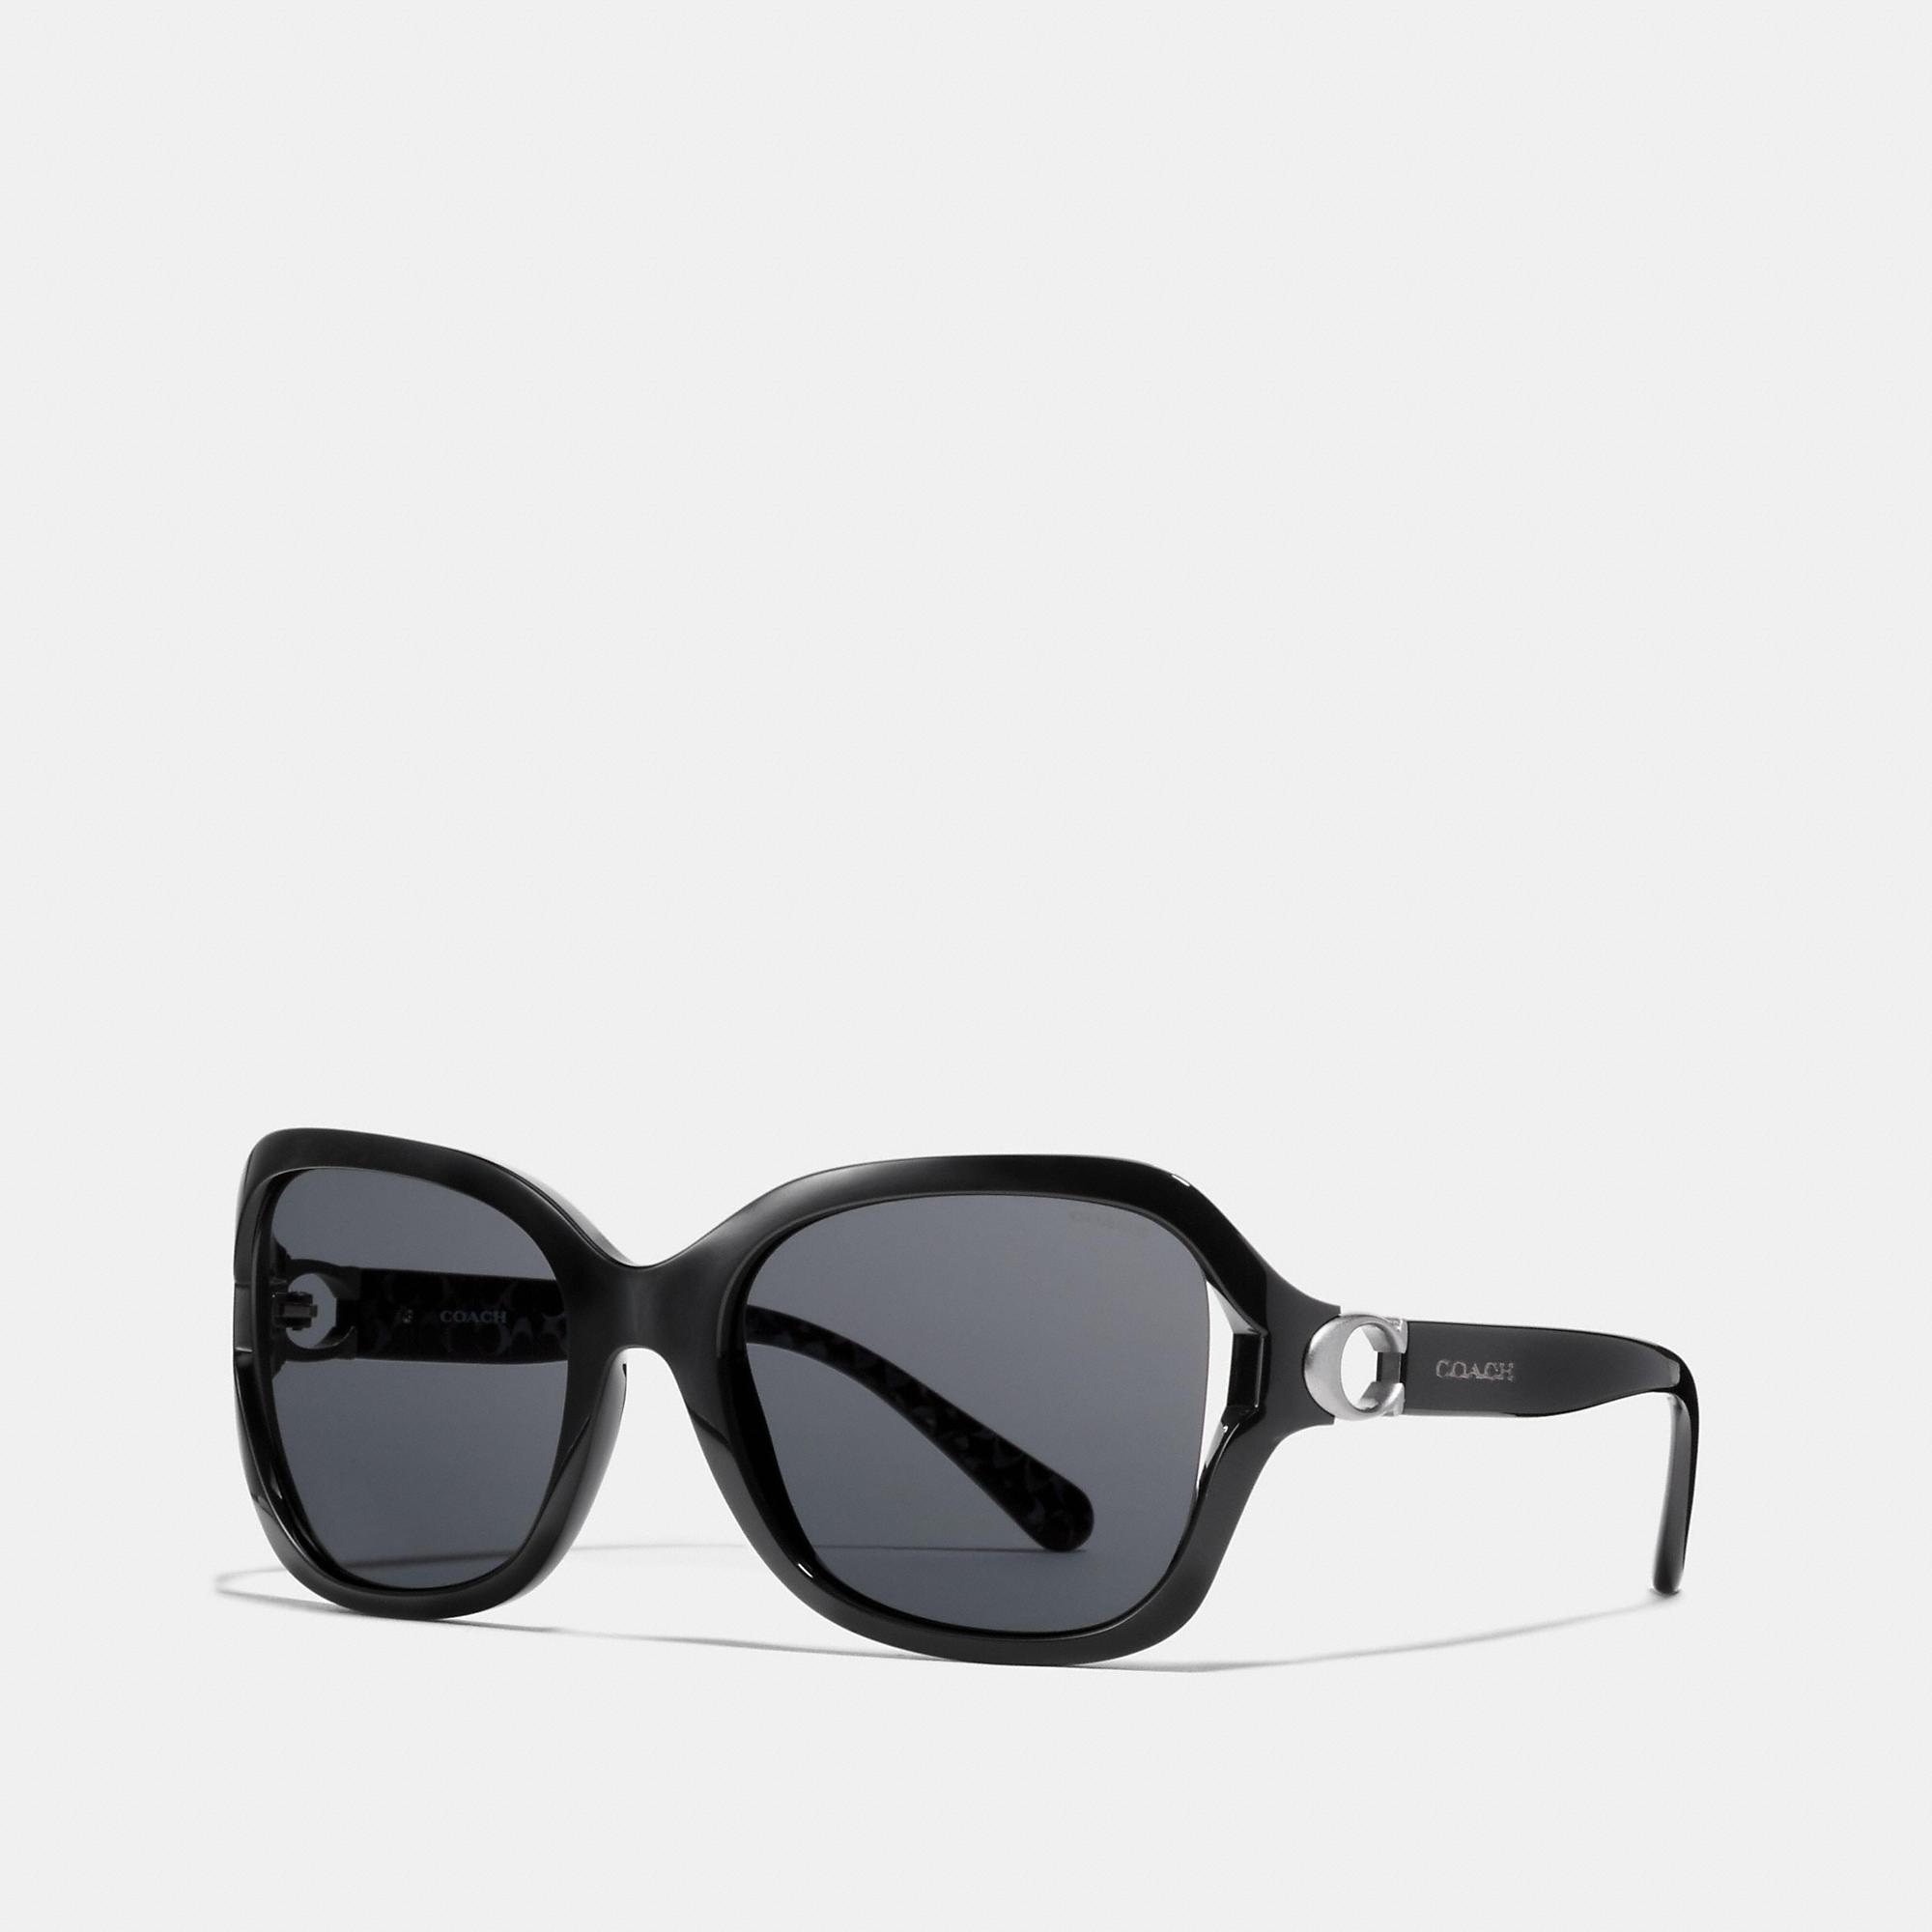 11333fa03b1e COACH Black Signature Hardware Sunglasses. View fullscreen